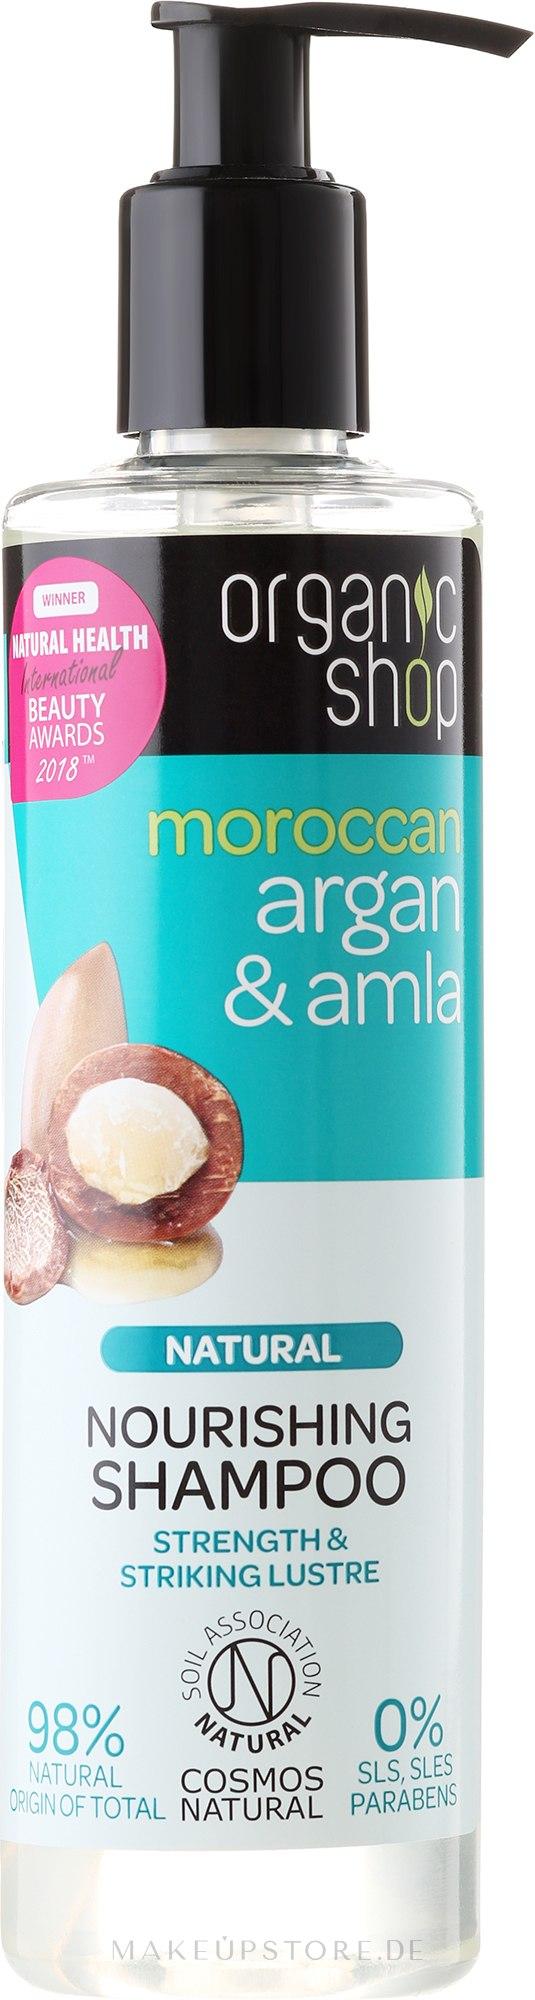 Nährendes Shampoo mit Arganöl & Amla - Organic Shop Argan & Amla Nourishing Shampoo — Bild 280 ml